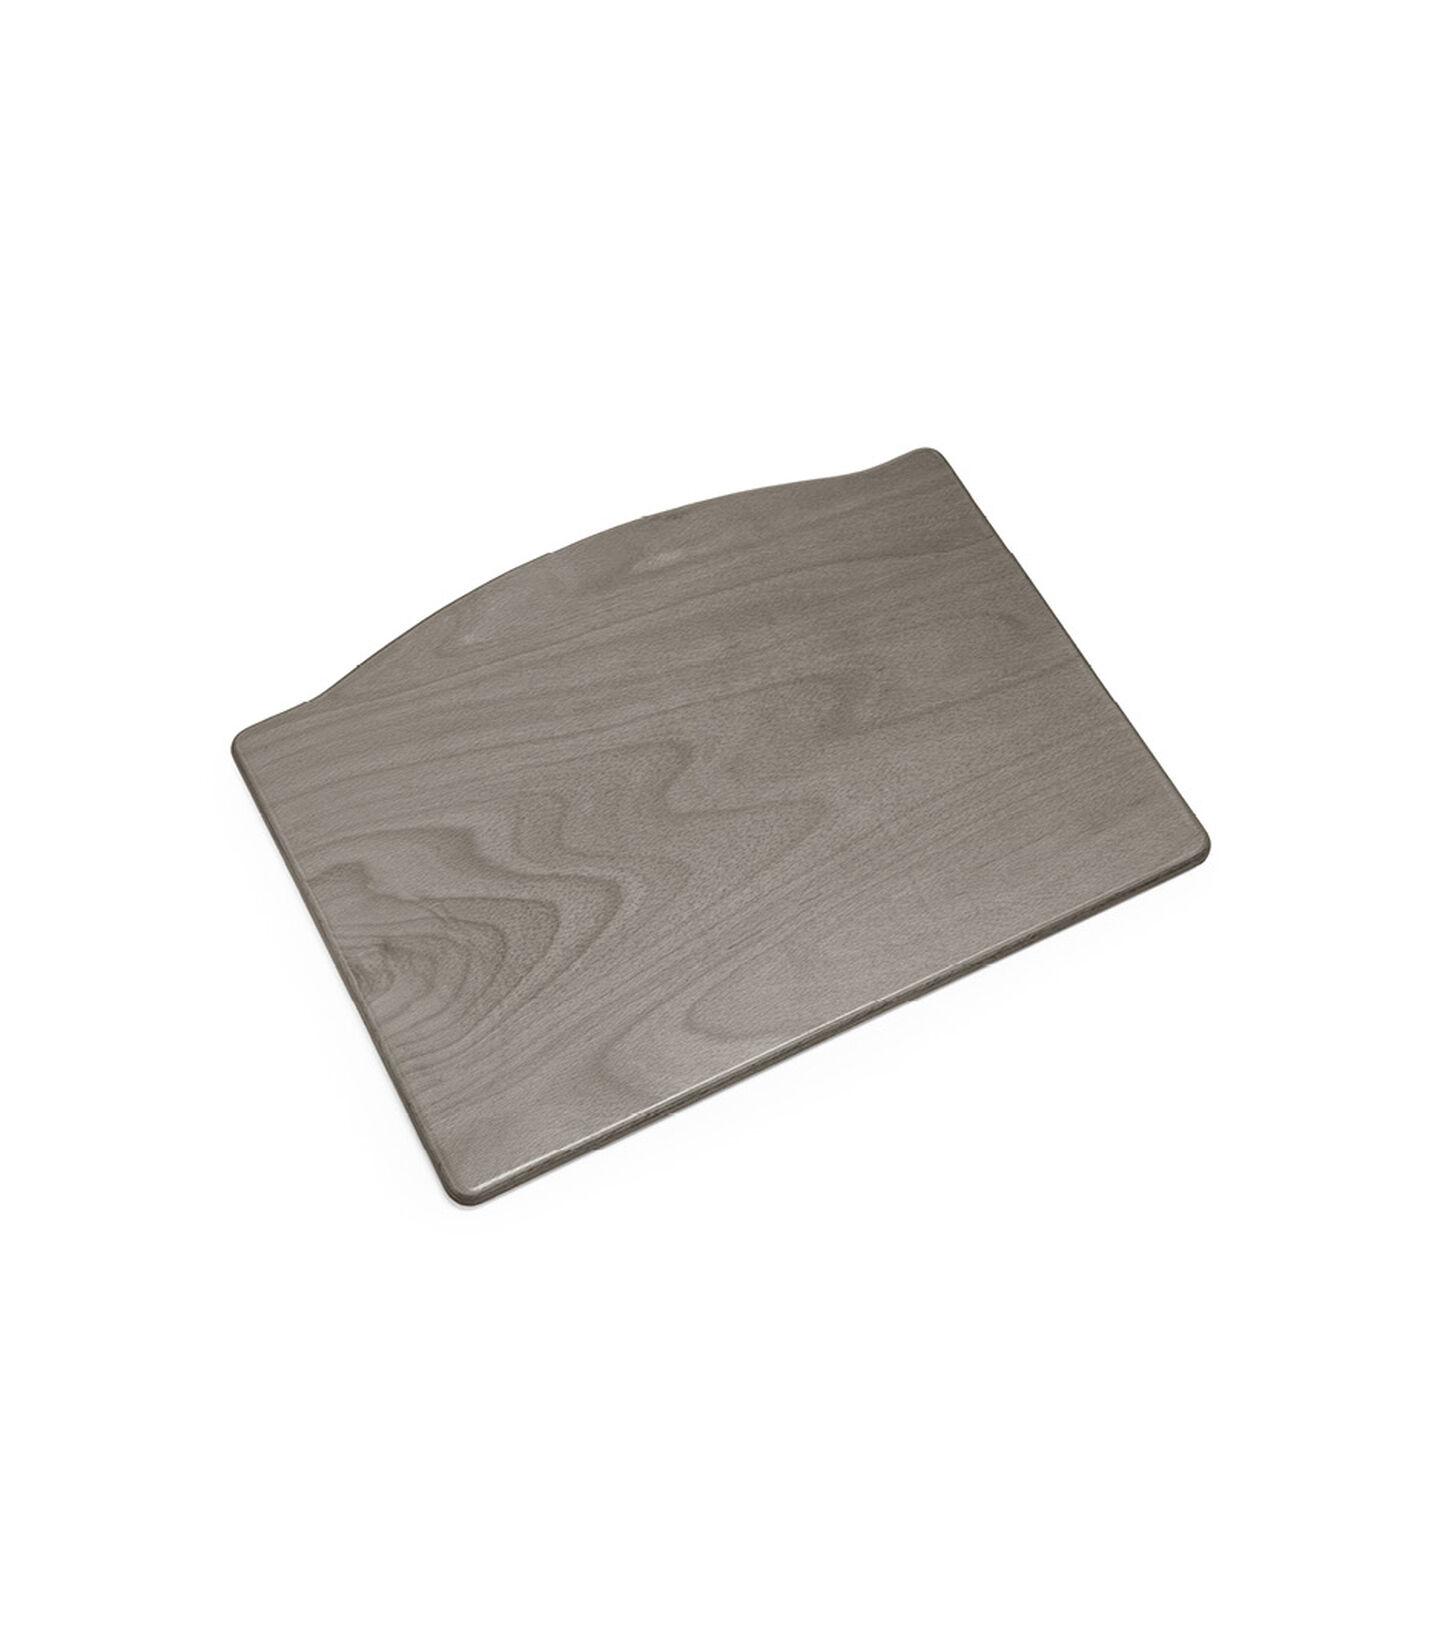 Tripp Trapp® Footplate Hazy Grey, Gris Brume, mainview view 1